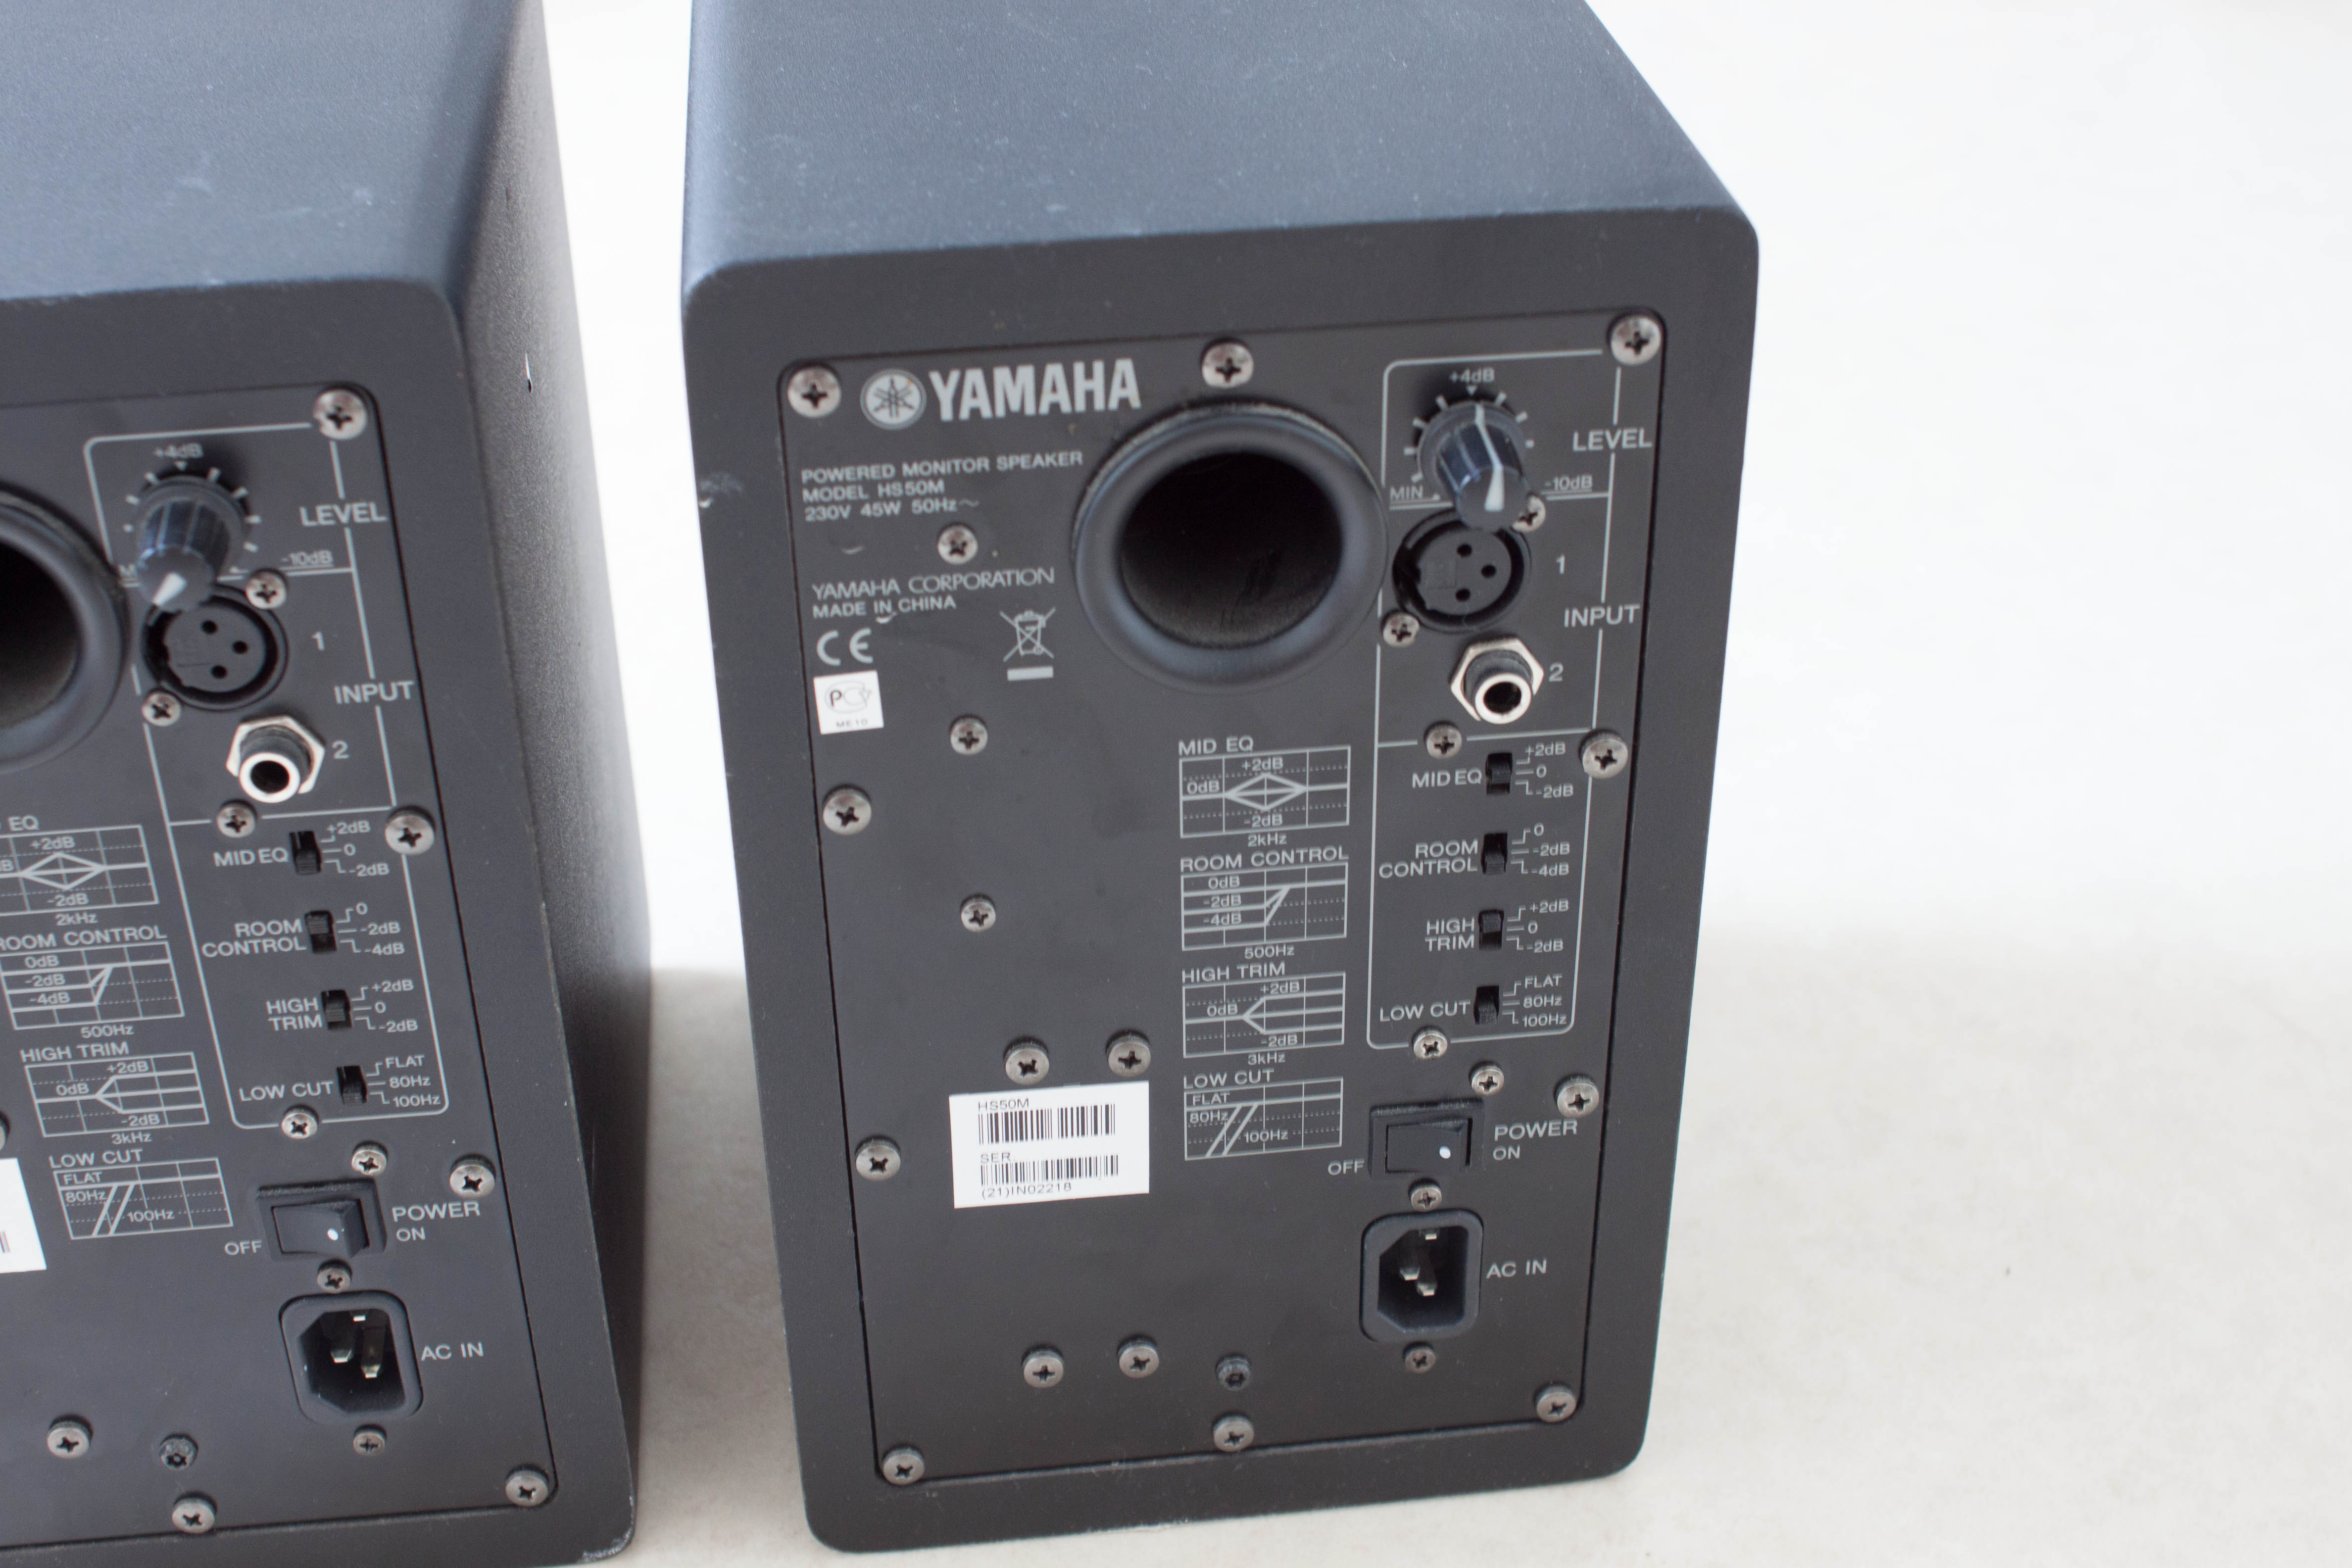 Yamaha hs50m image 1428546 audiofanzine for Yamaha hs50m review